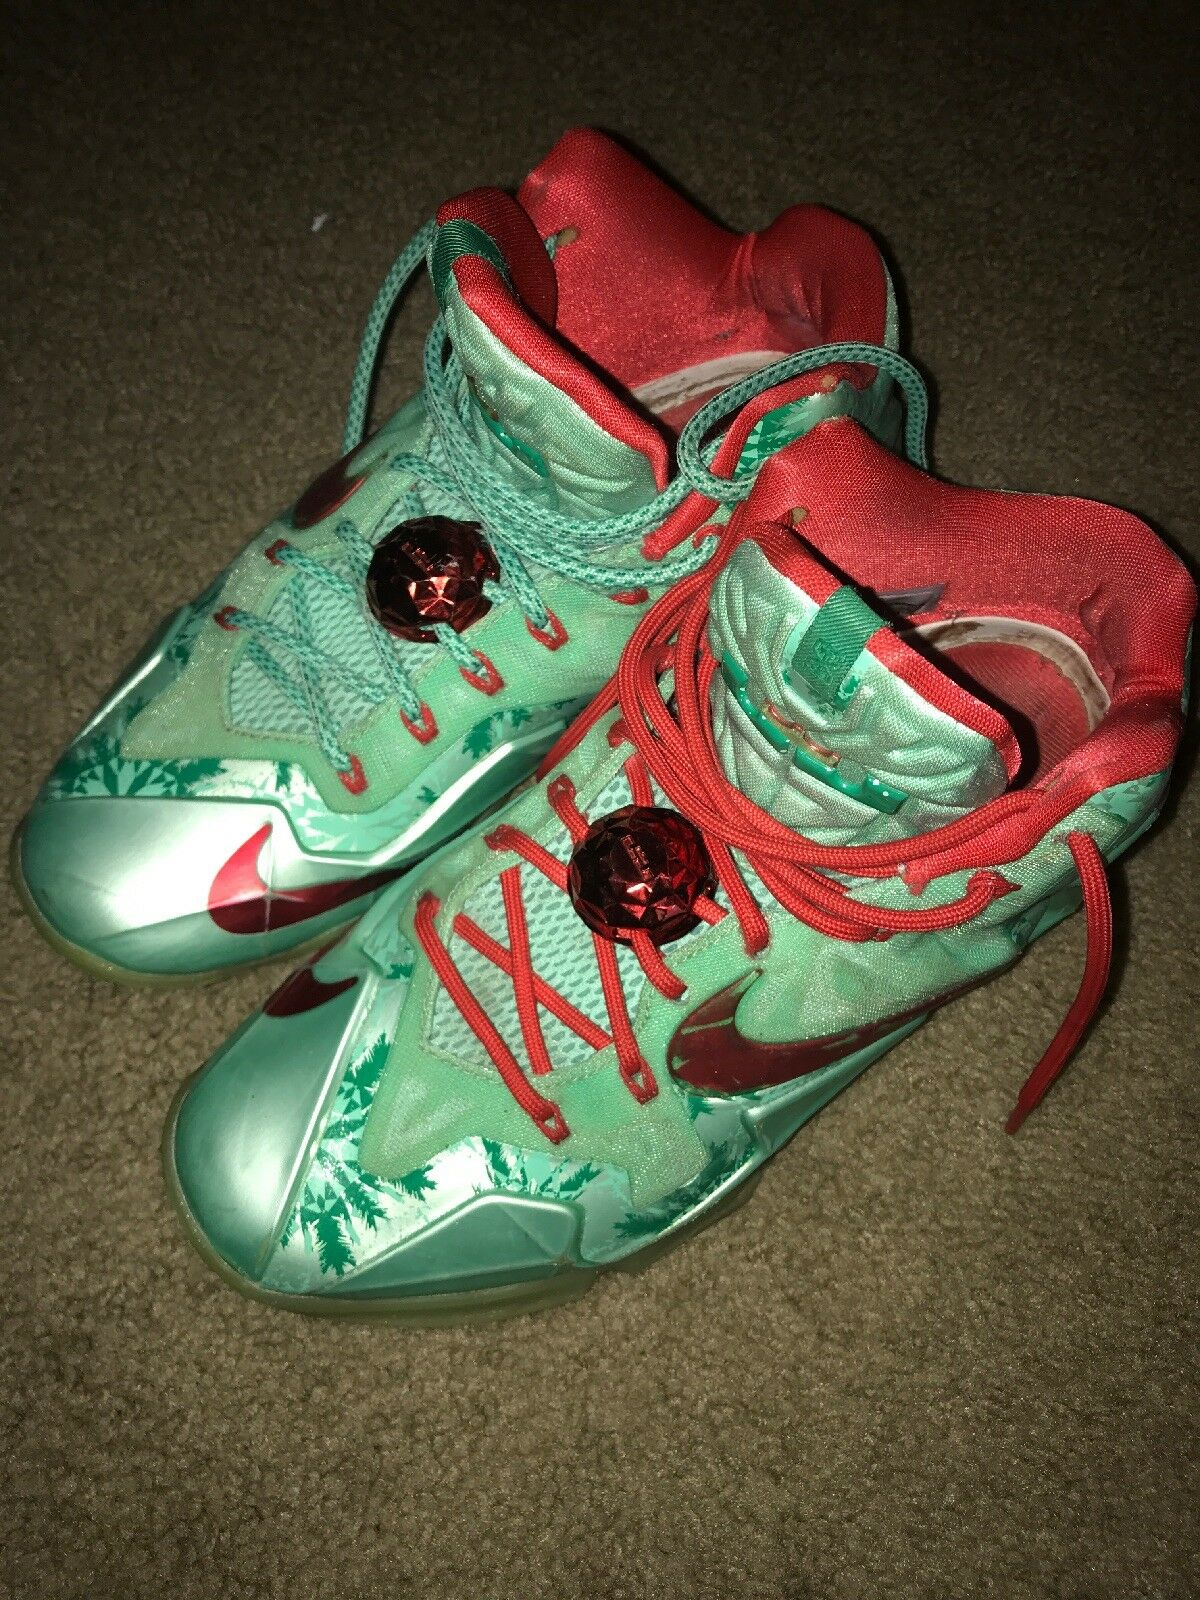 Lebron XI Christmas's Basketball Shoes Green/Red, Size 8.5 U.S.